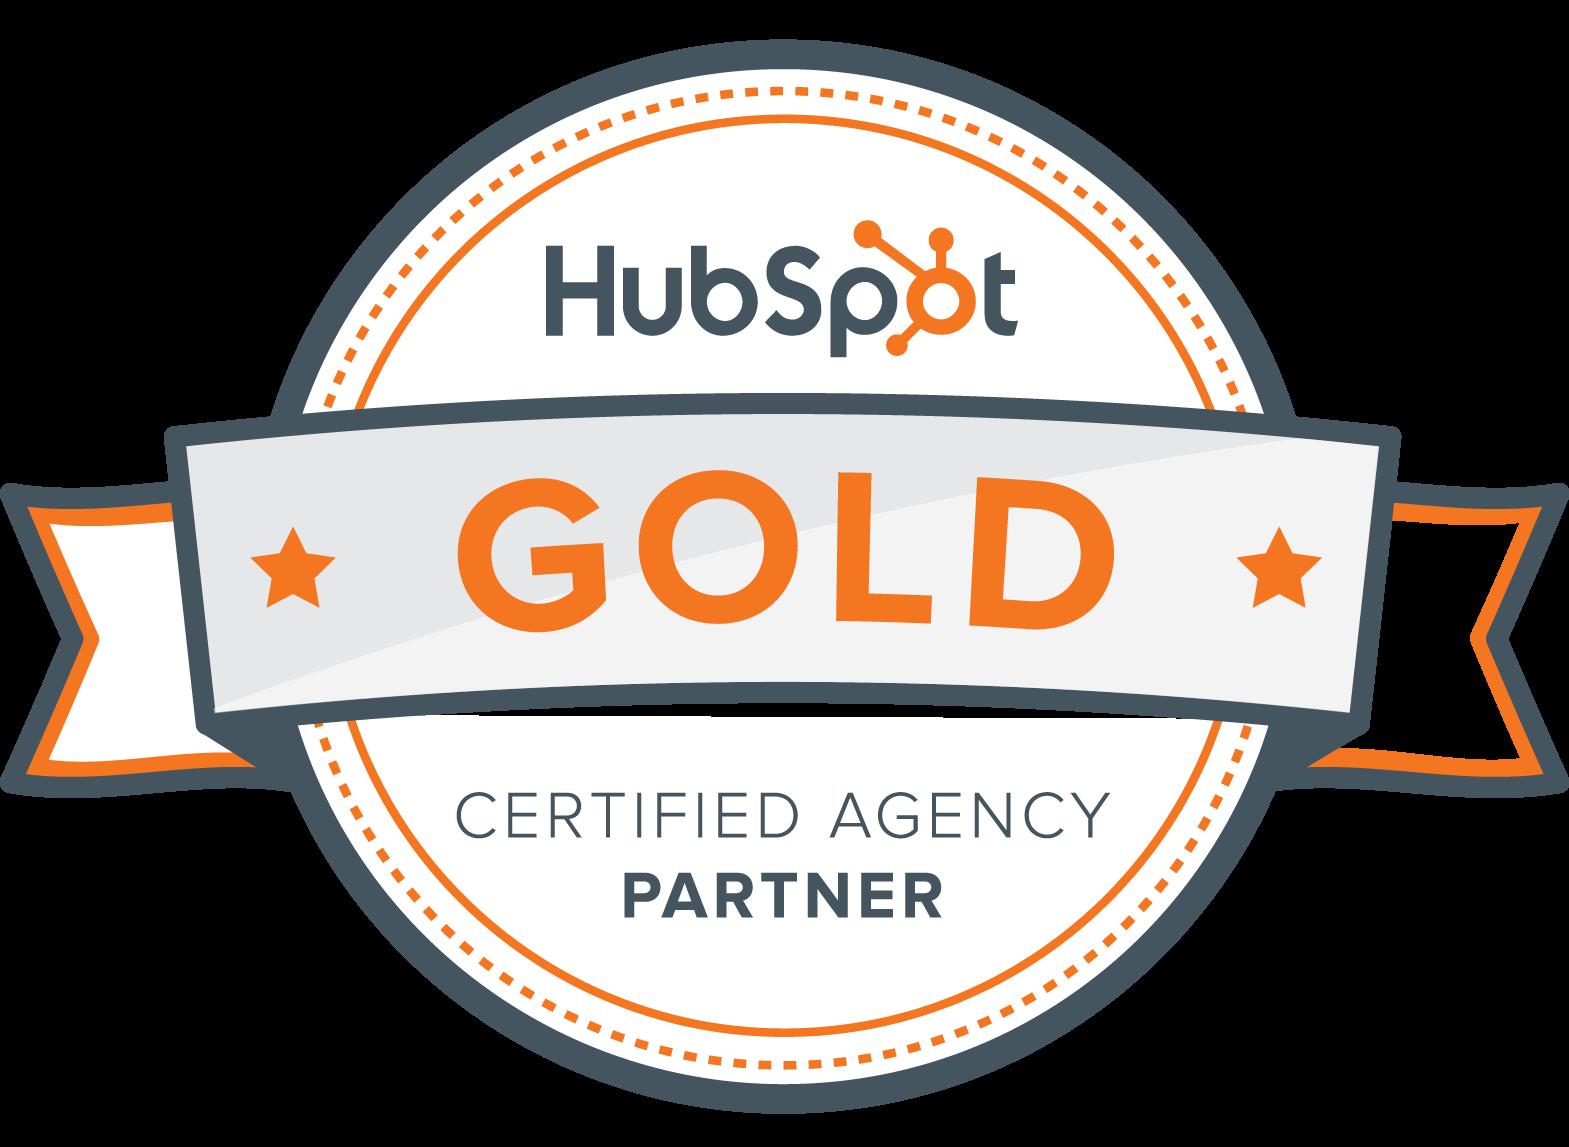 Agence Partenaire HubSpot GOLD Copernic